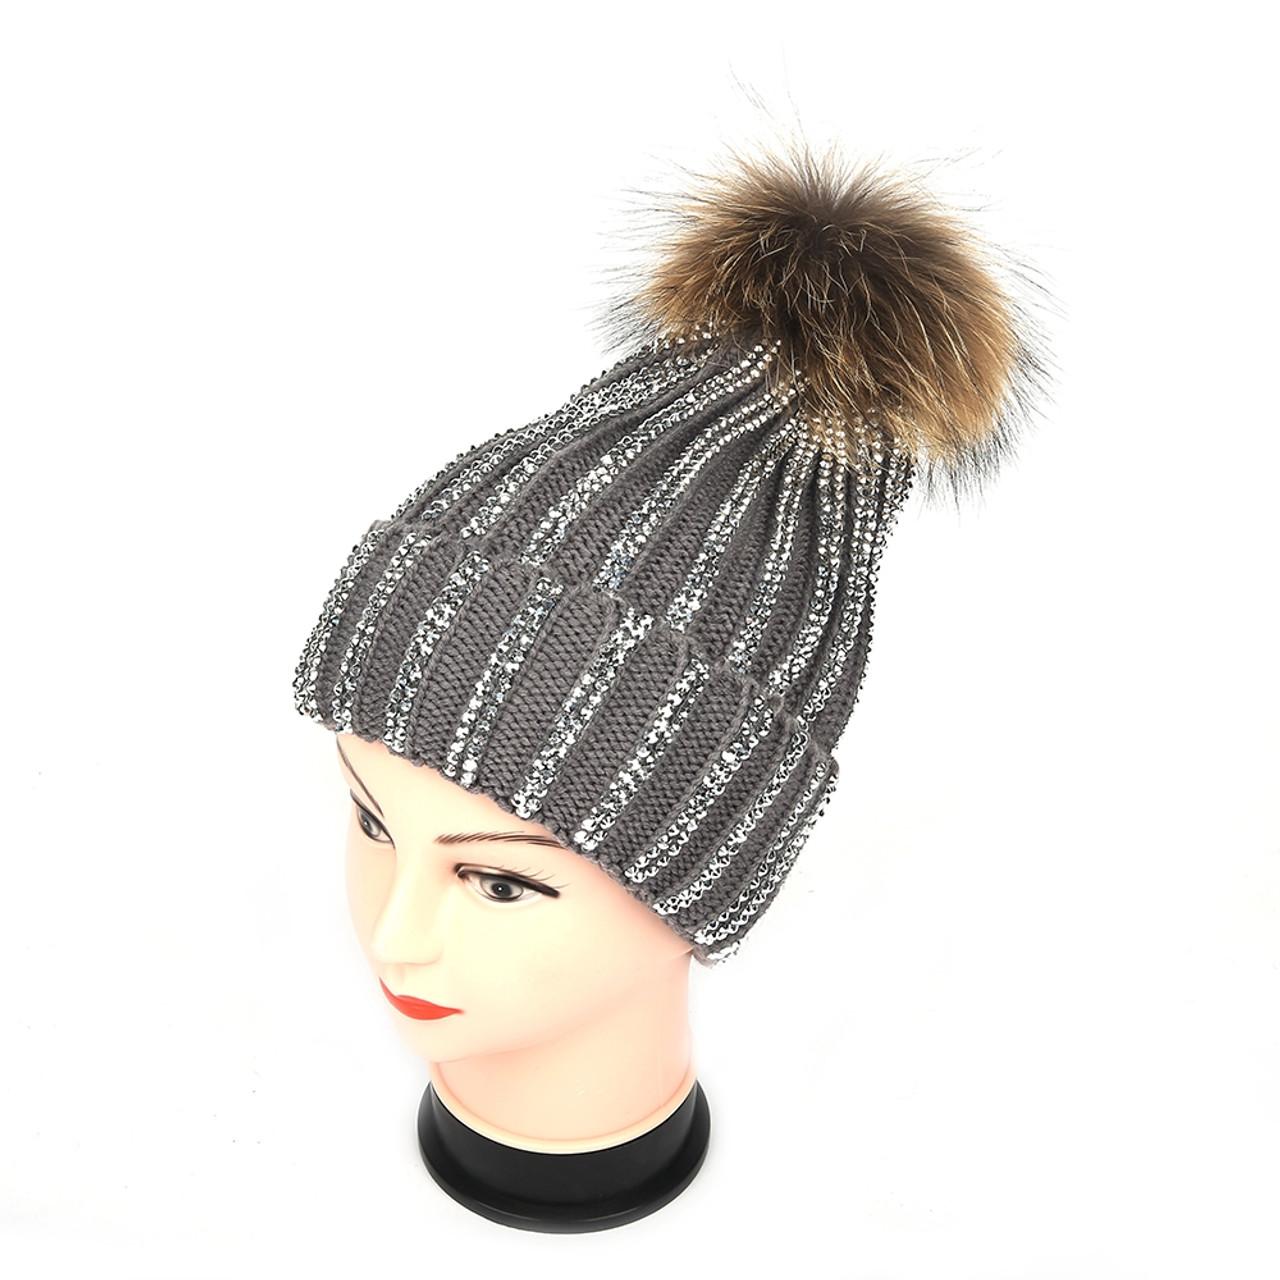 299e0b795 Pack of 12pcs Real Fur Pom Pom Diamante Hat XD-1701-2700 in 8 Colours